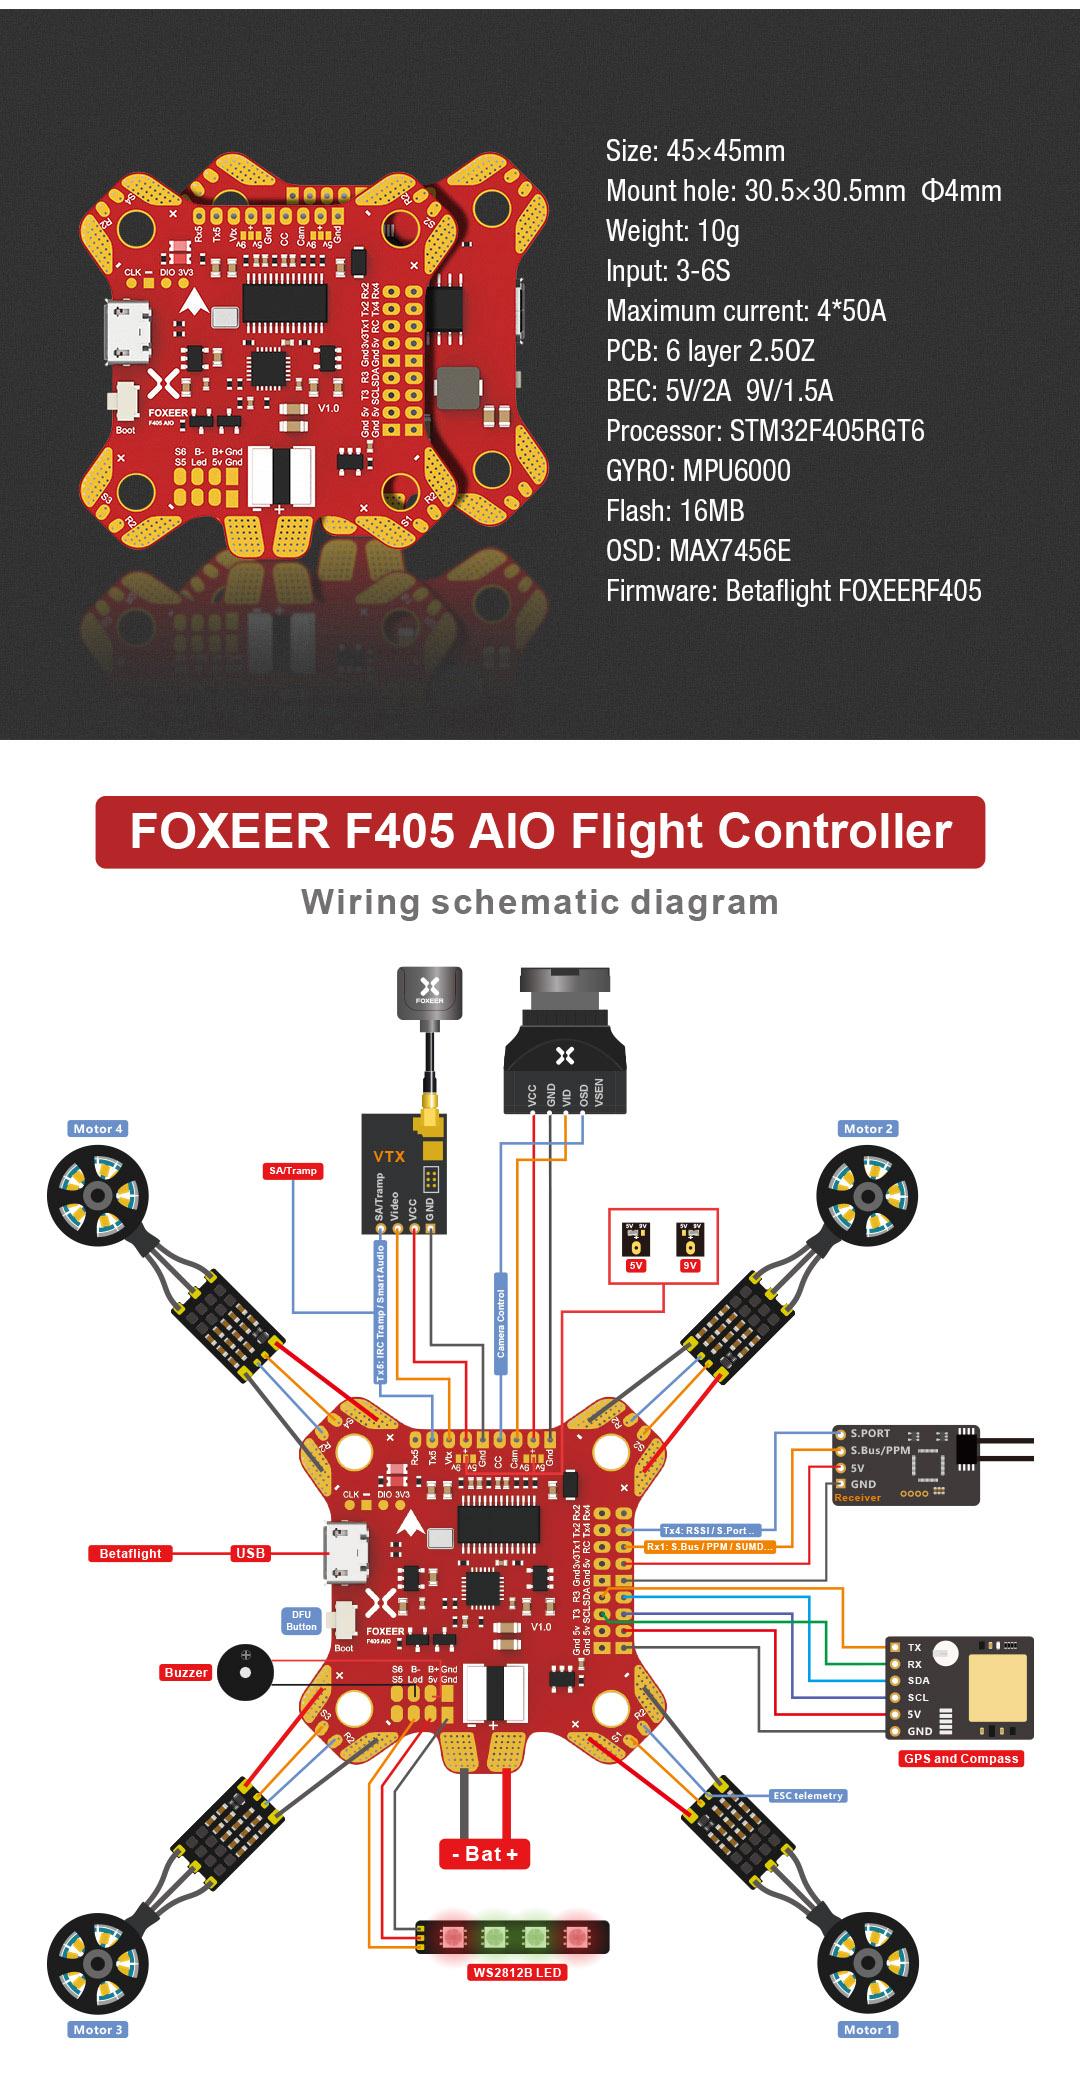 FOXEER F405 AIO BetaFlight Flight Controller